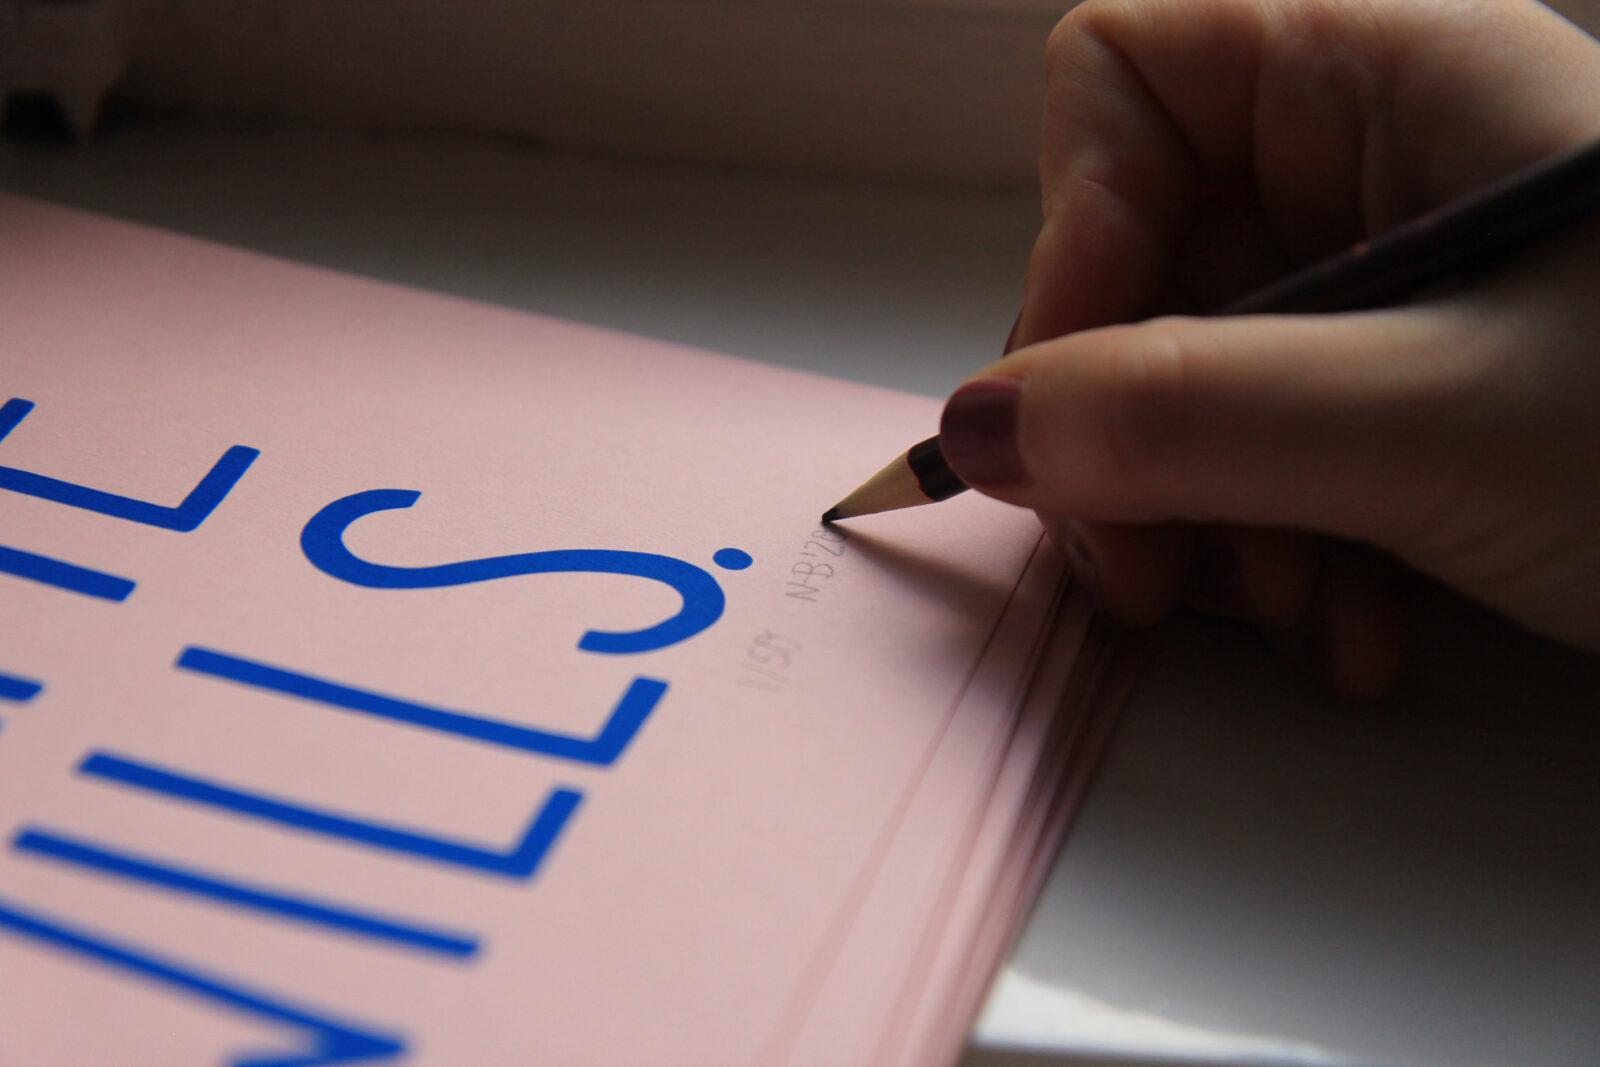 Mach doch watte wills lettering special edition art print kunstdruck poster interior signiert ruhrpott